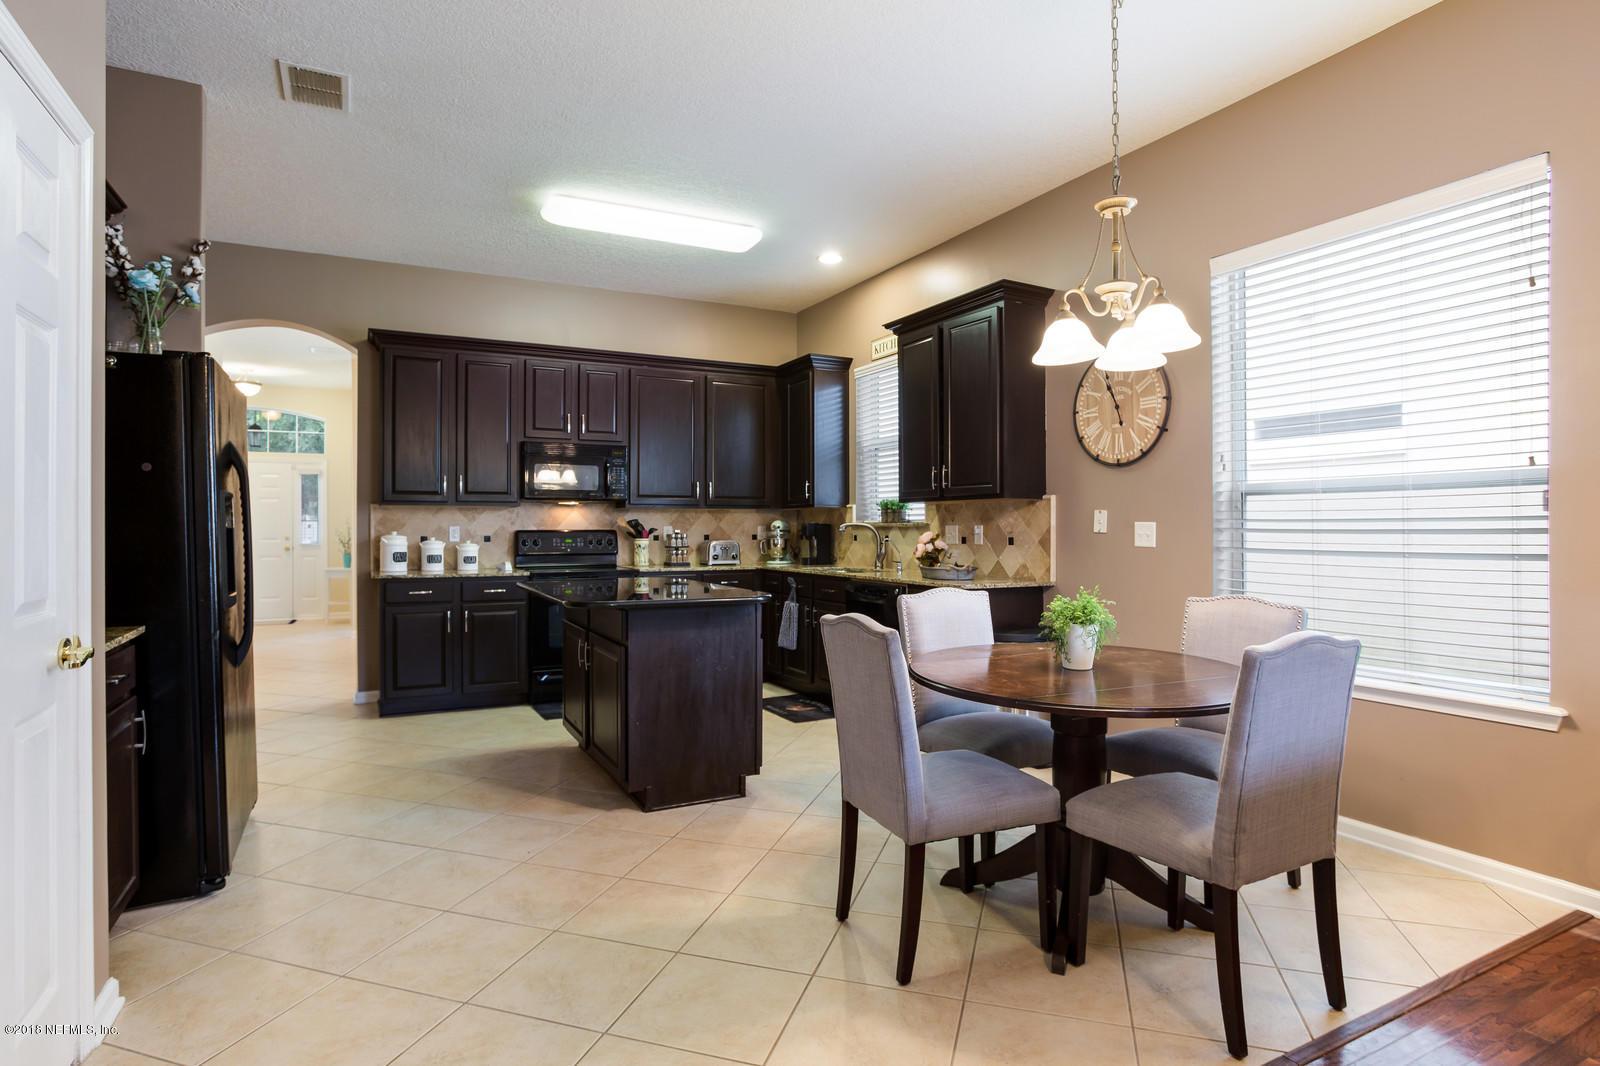 3818 WESTRIDGE, ORANGE PARK, FLORIDA 32065, 4 Bedrooms Bedrooms, ,2 BathroomsBathrooms,Residential - single family,For sale,WESTRIDGE,960307